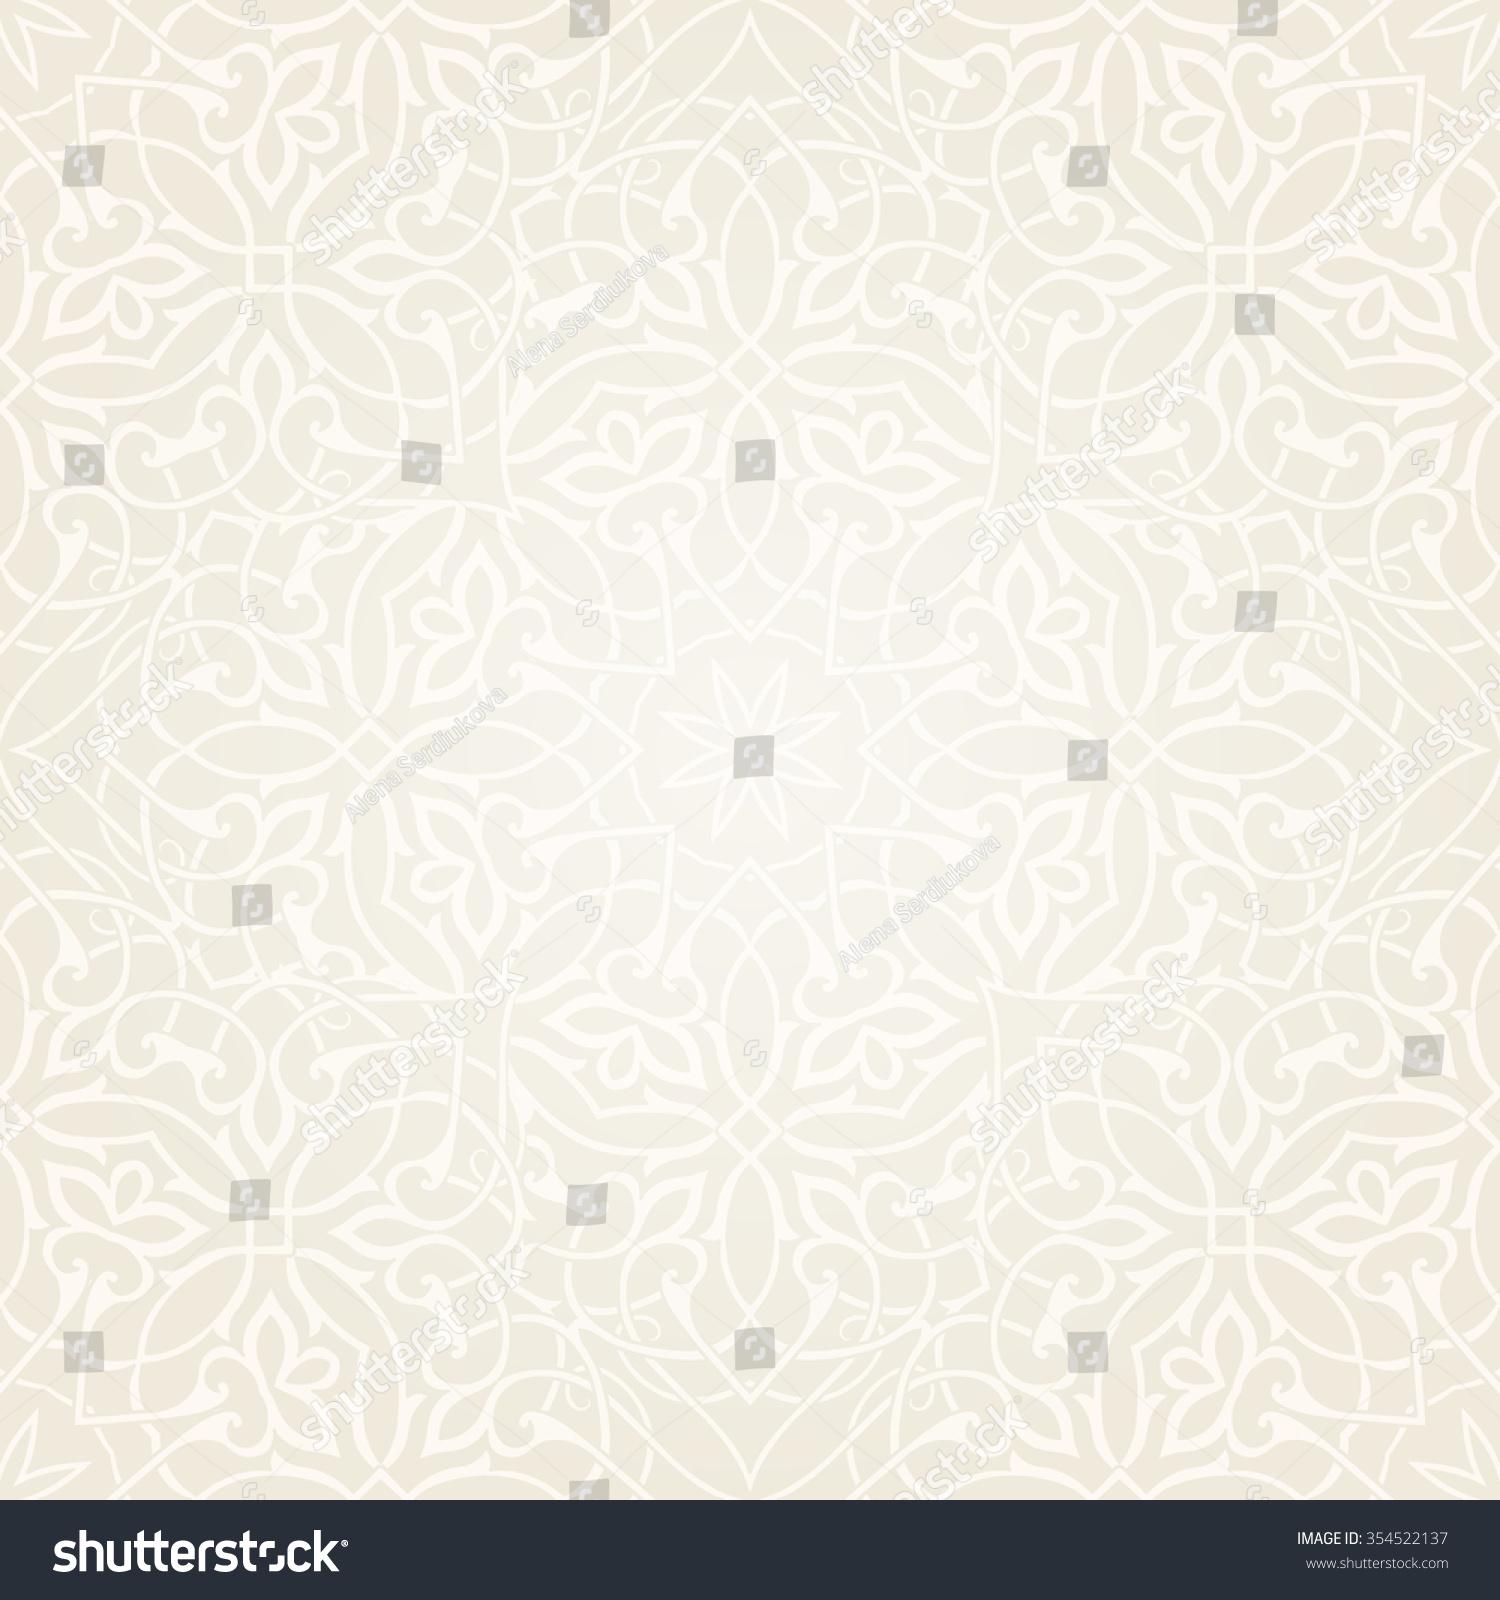 Filigree Patterns Patterns Kid